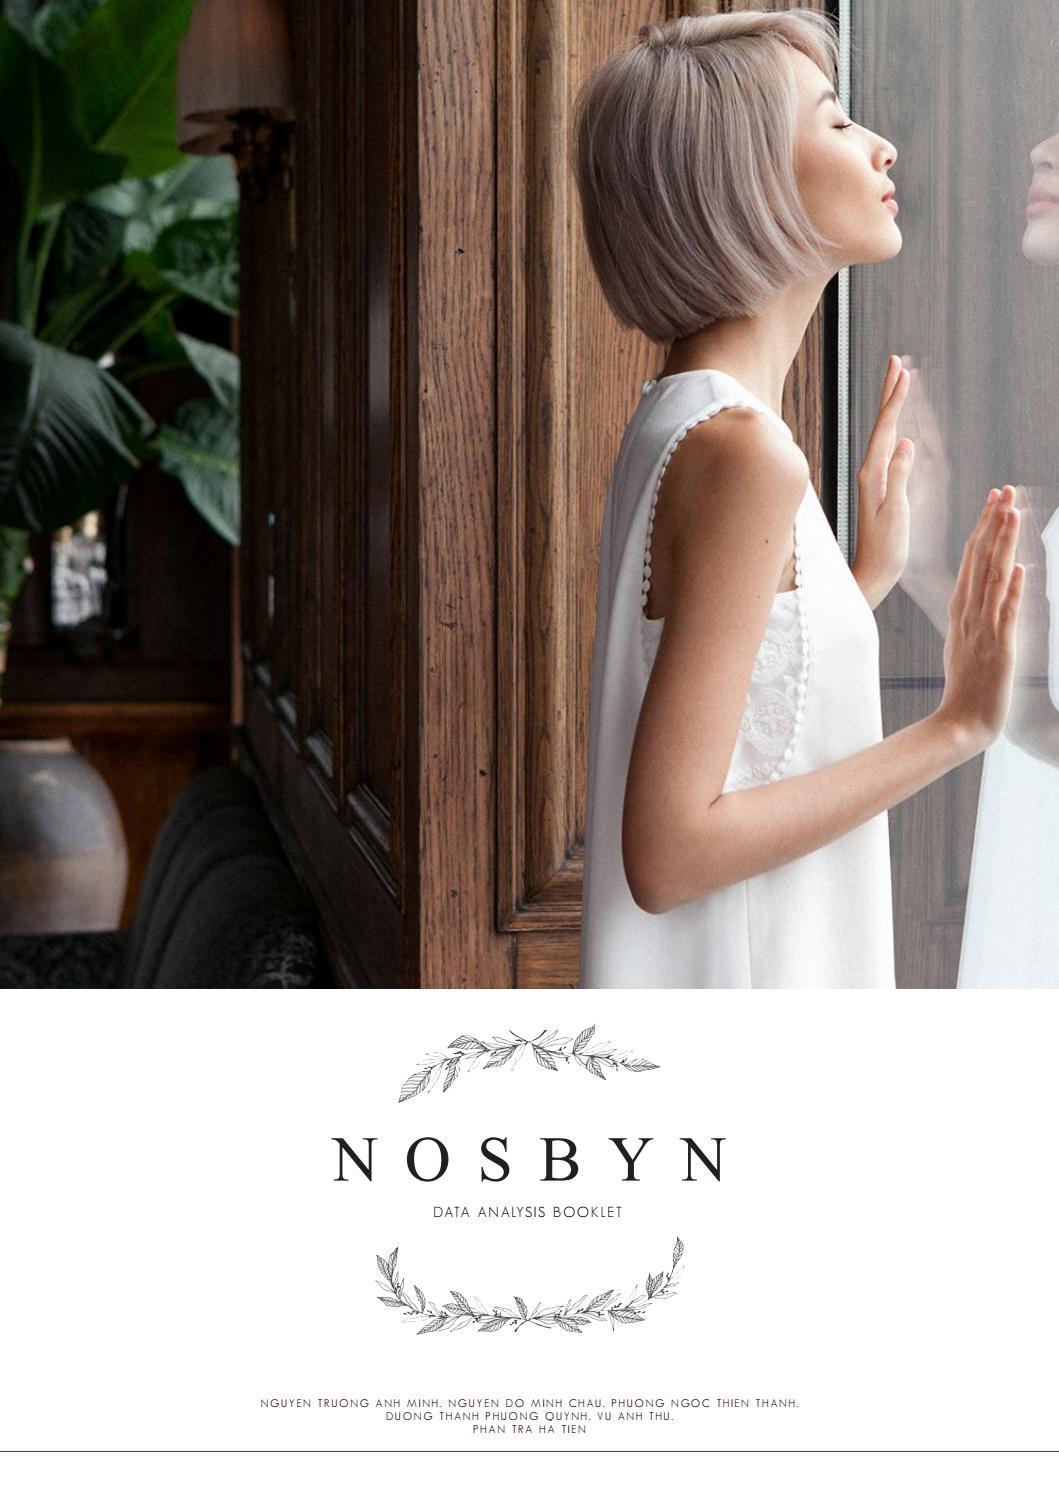 MARKET RESEARCH DATA ANALYSIS FOR NOSBYN by Thư Vũ - issuu